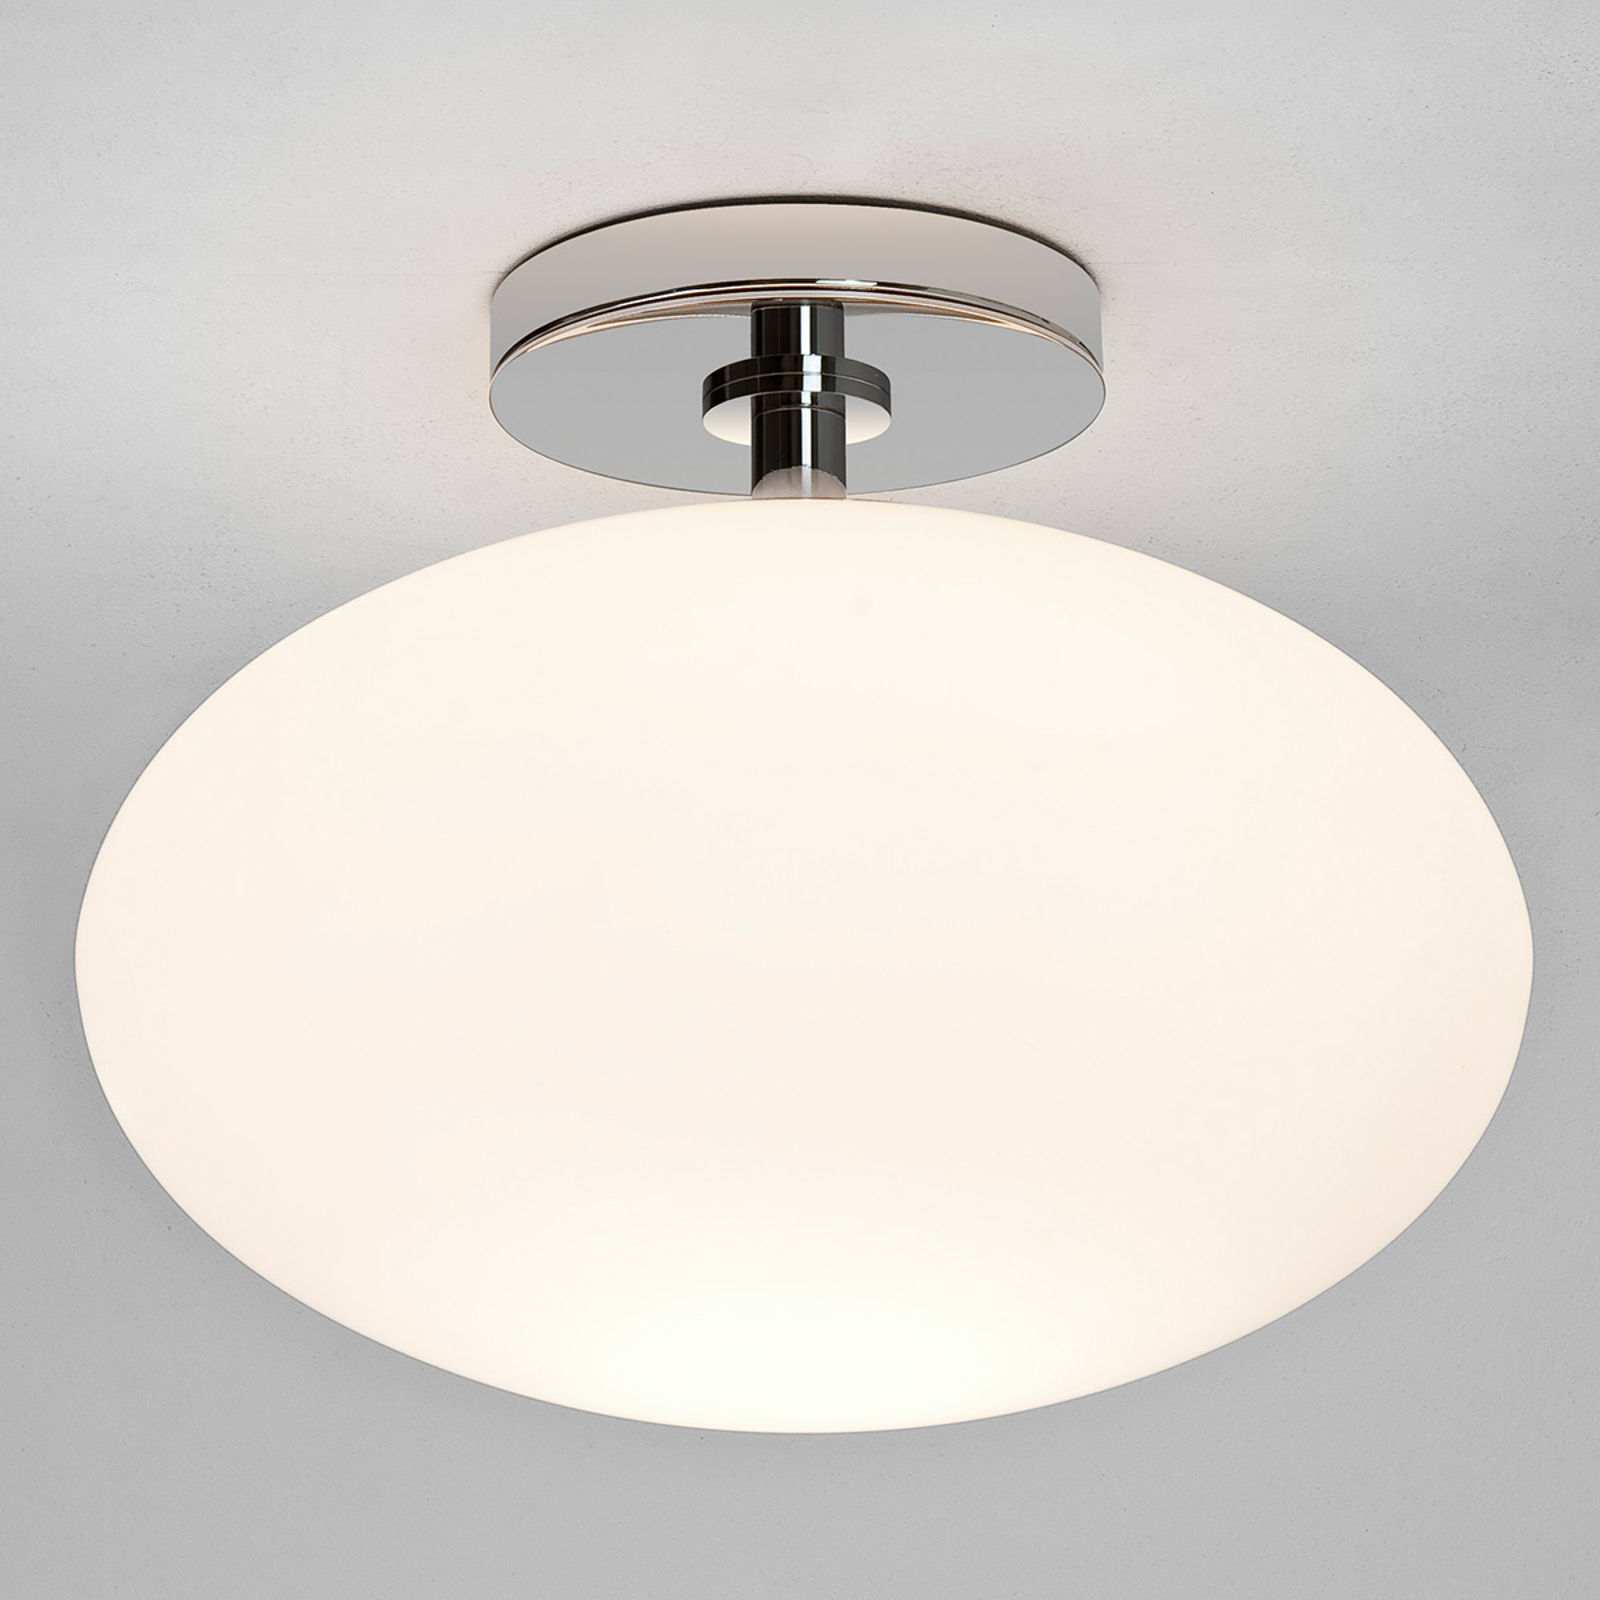 Zeppo Bathroom Ceiling Light Oval IP44_1020303_1